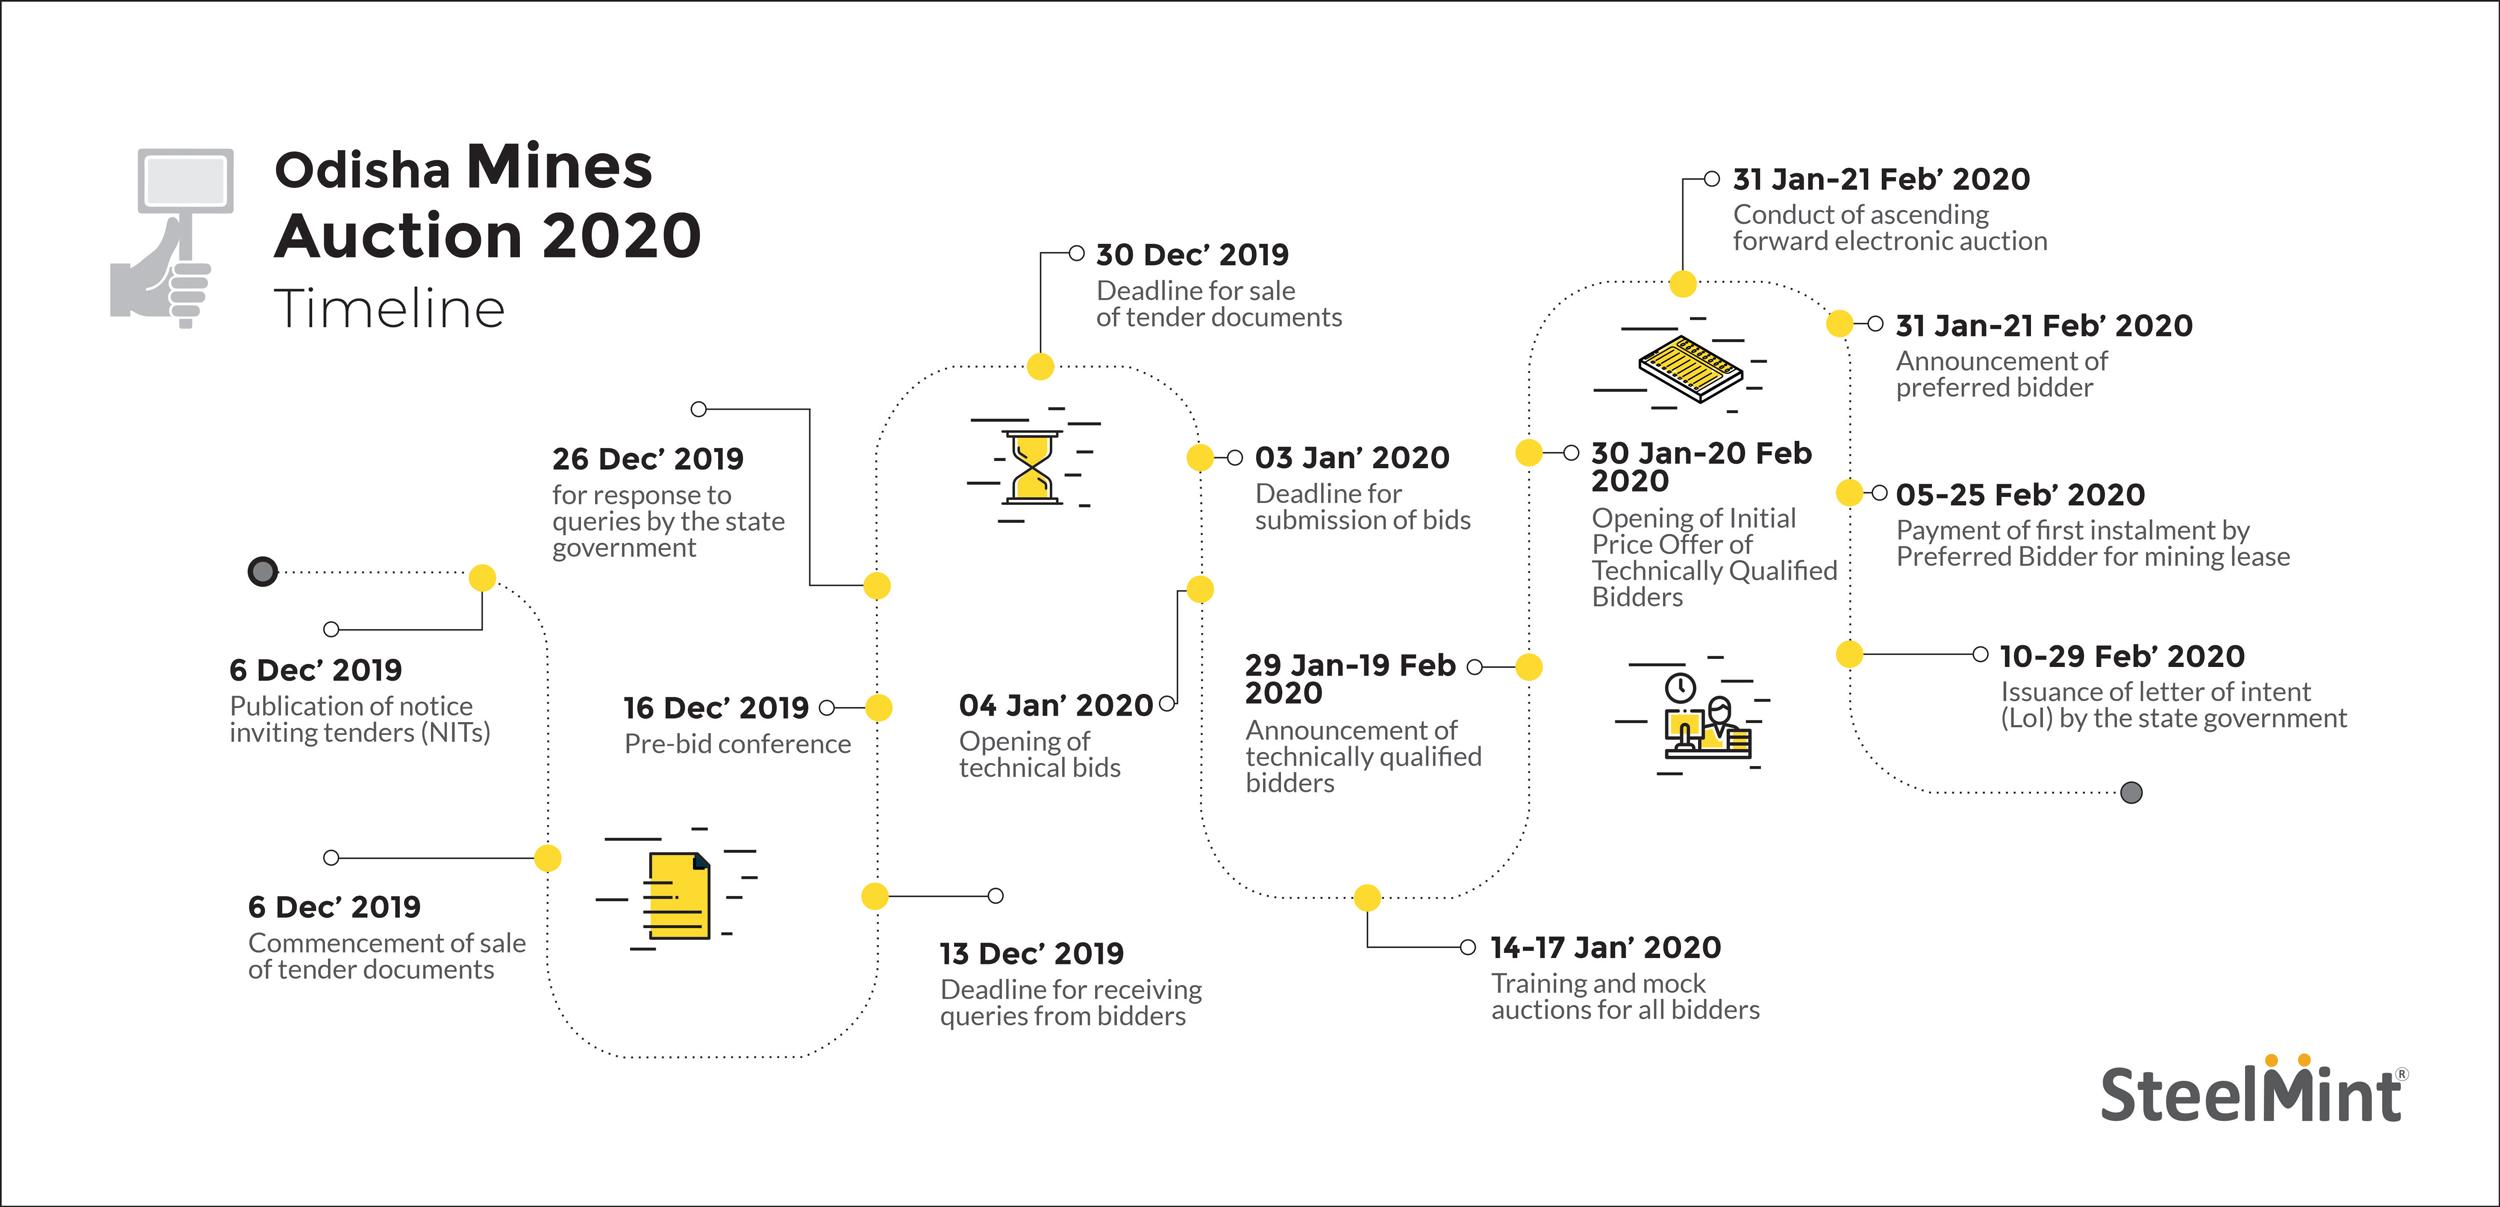 Timeline of Odisha Mines Auction - 2020